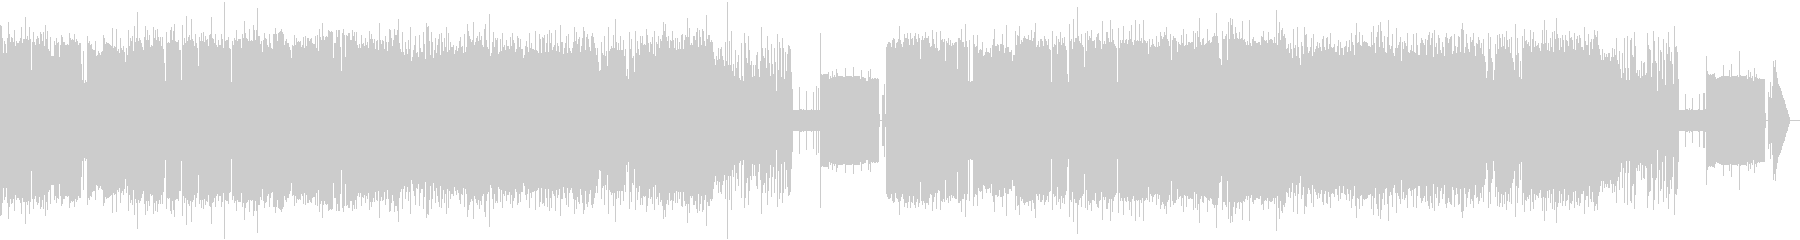 【8bit】白鳥の湖 情景 第2幕10番の未再生の波形